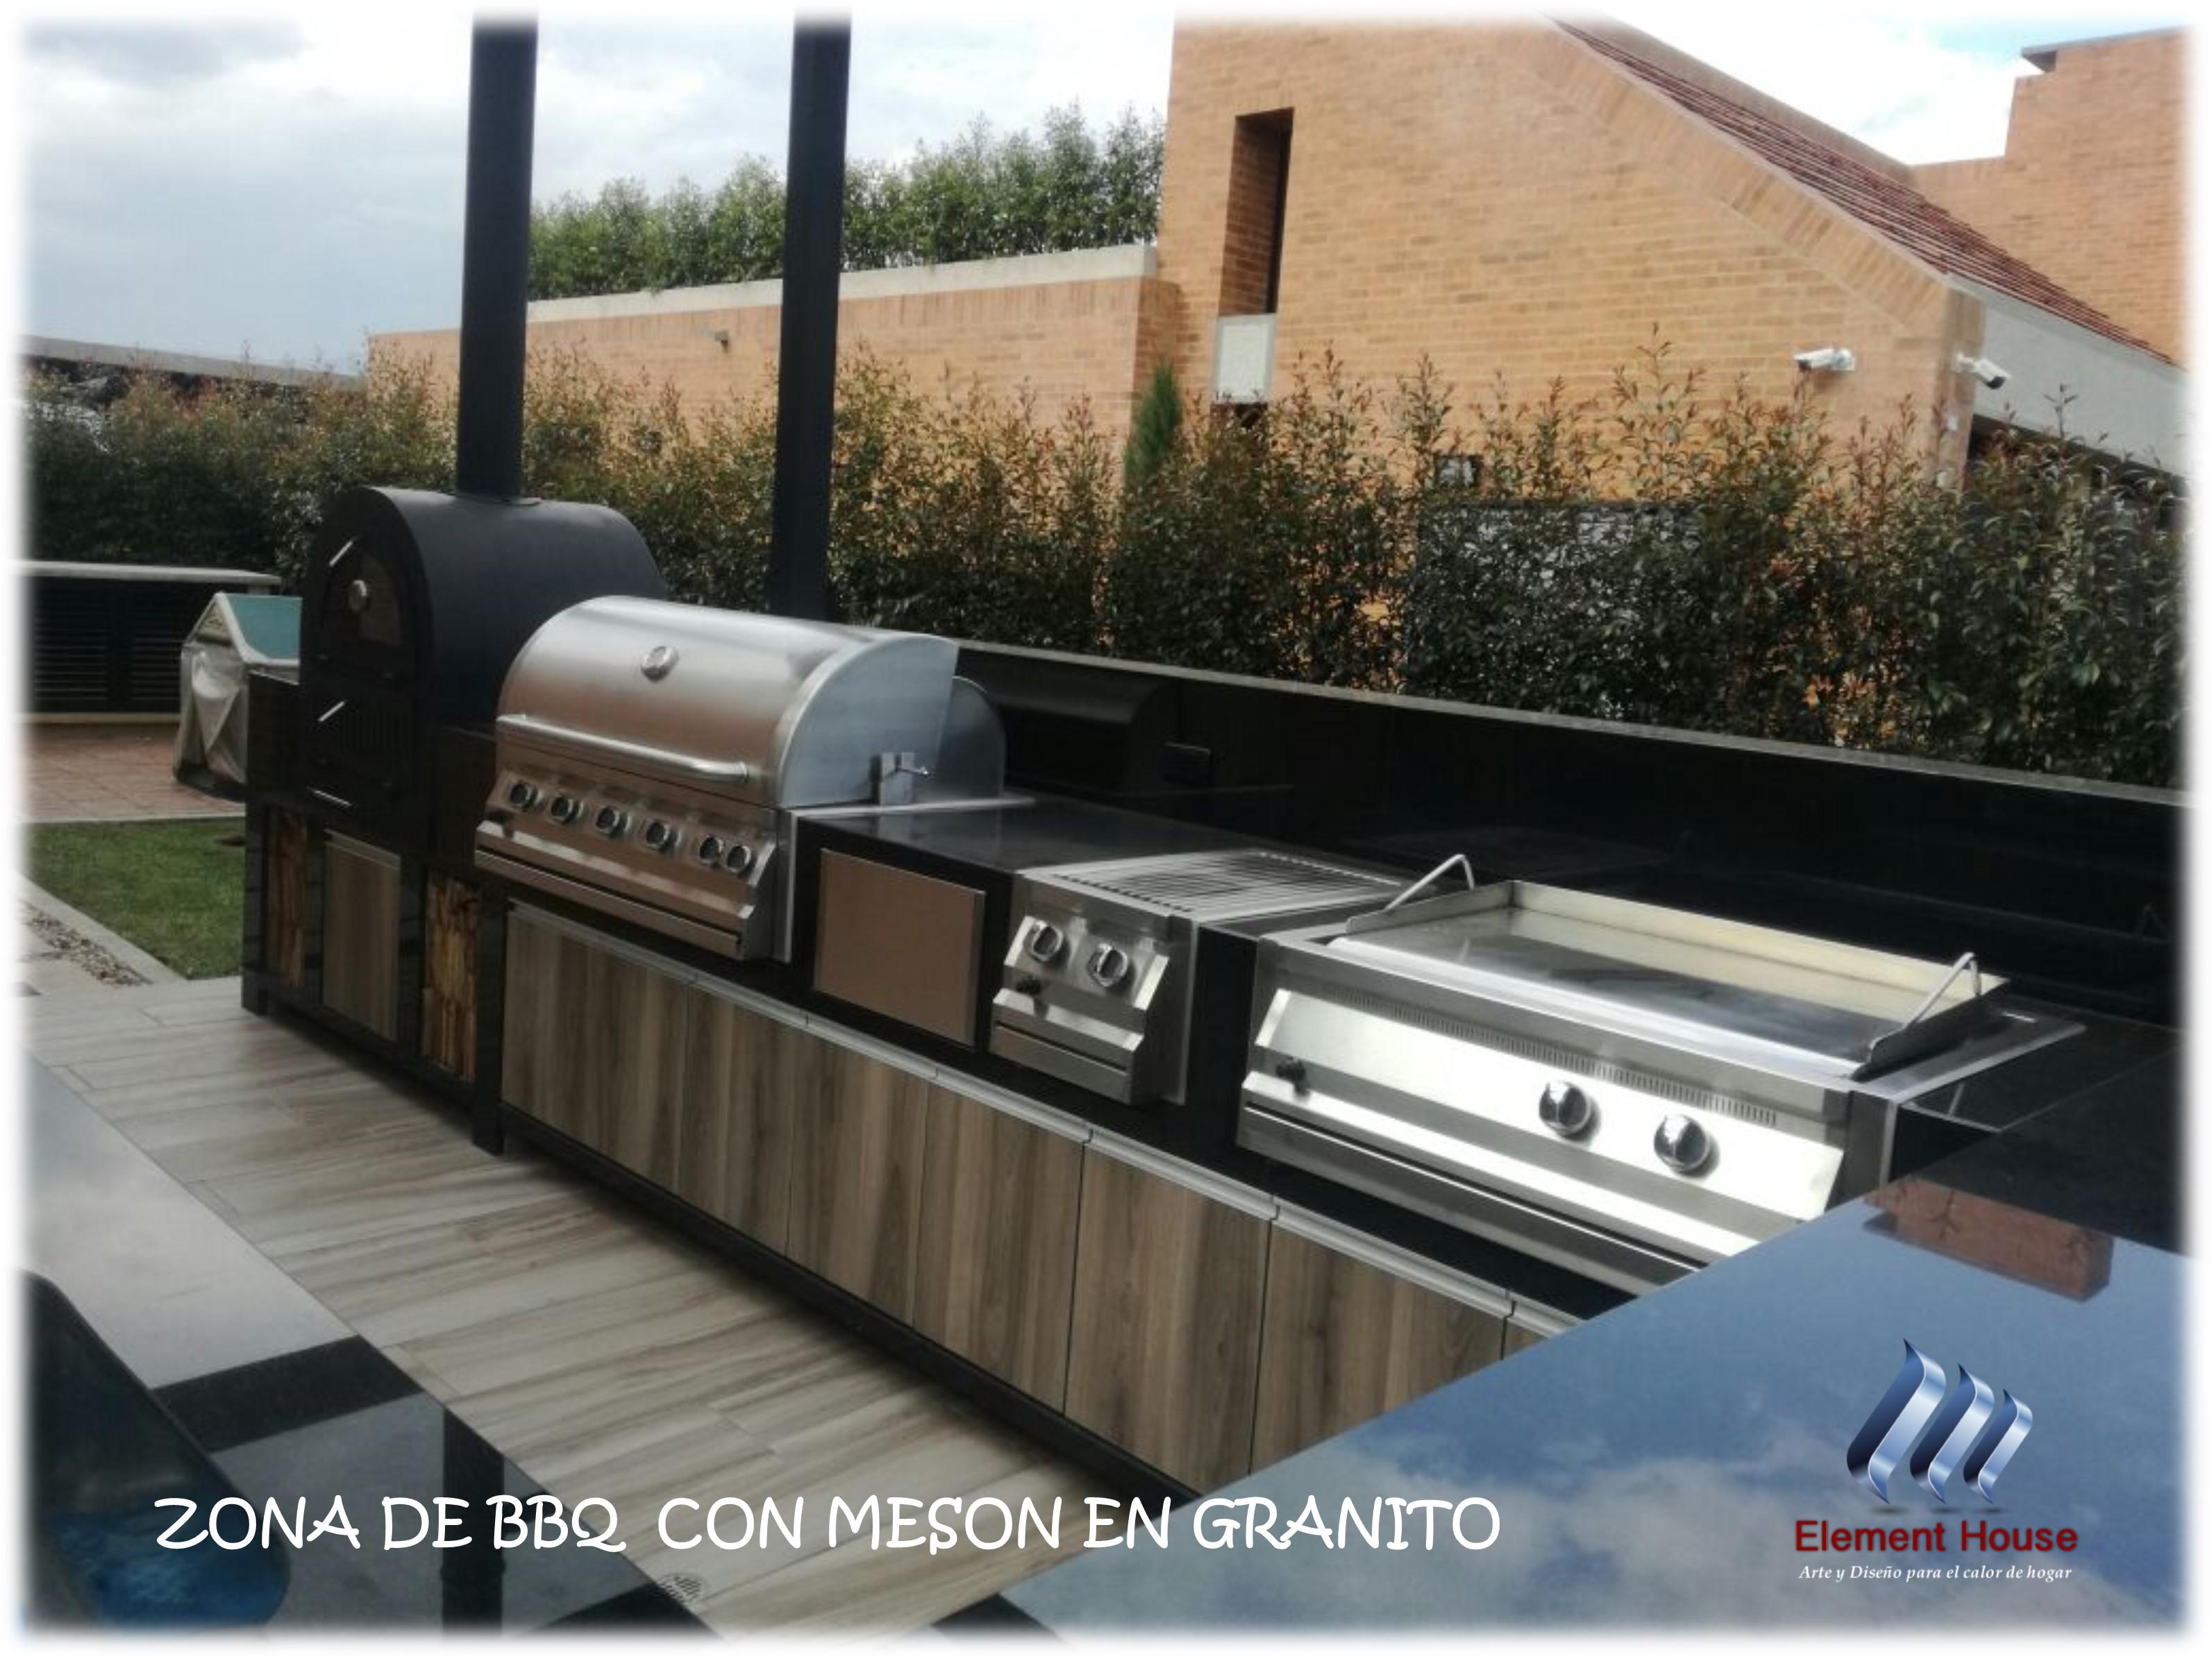 ZONA BBQ ELEMENT HOUSE